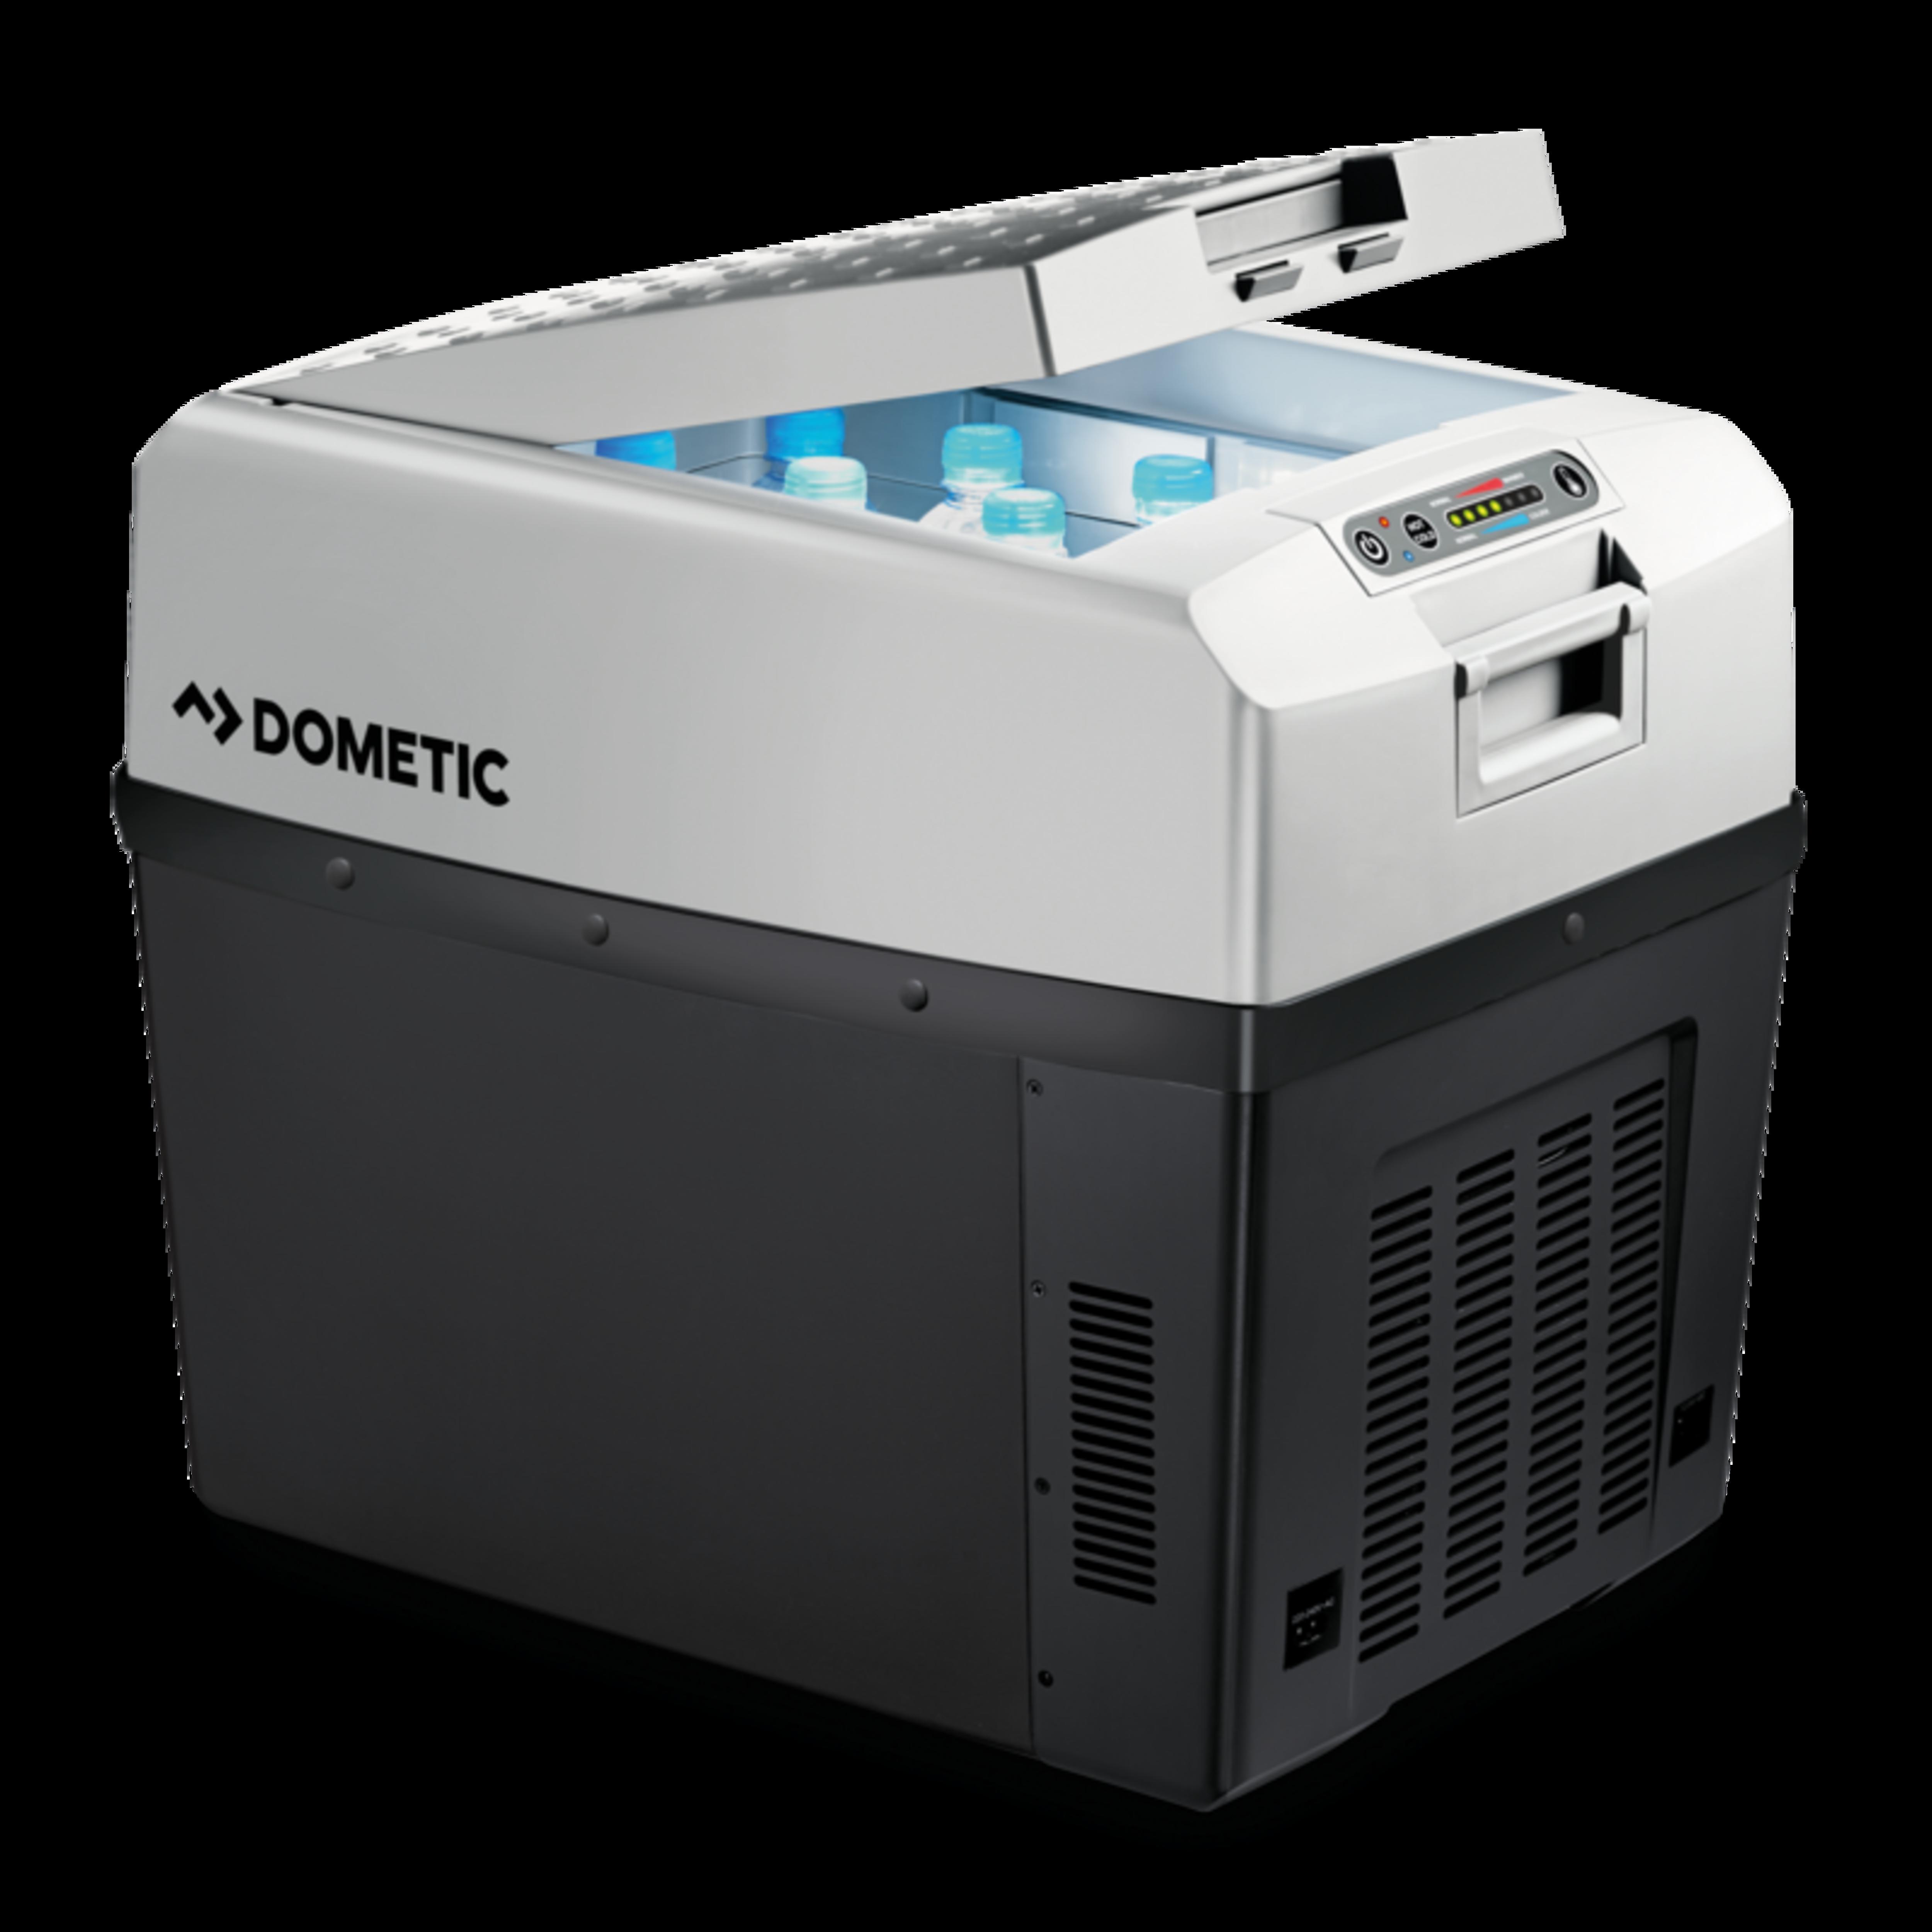 Dometic TropiCool TCX 35 Professional